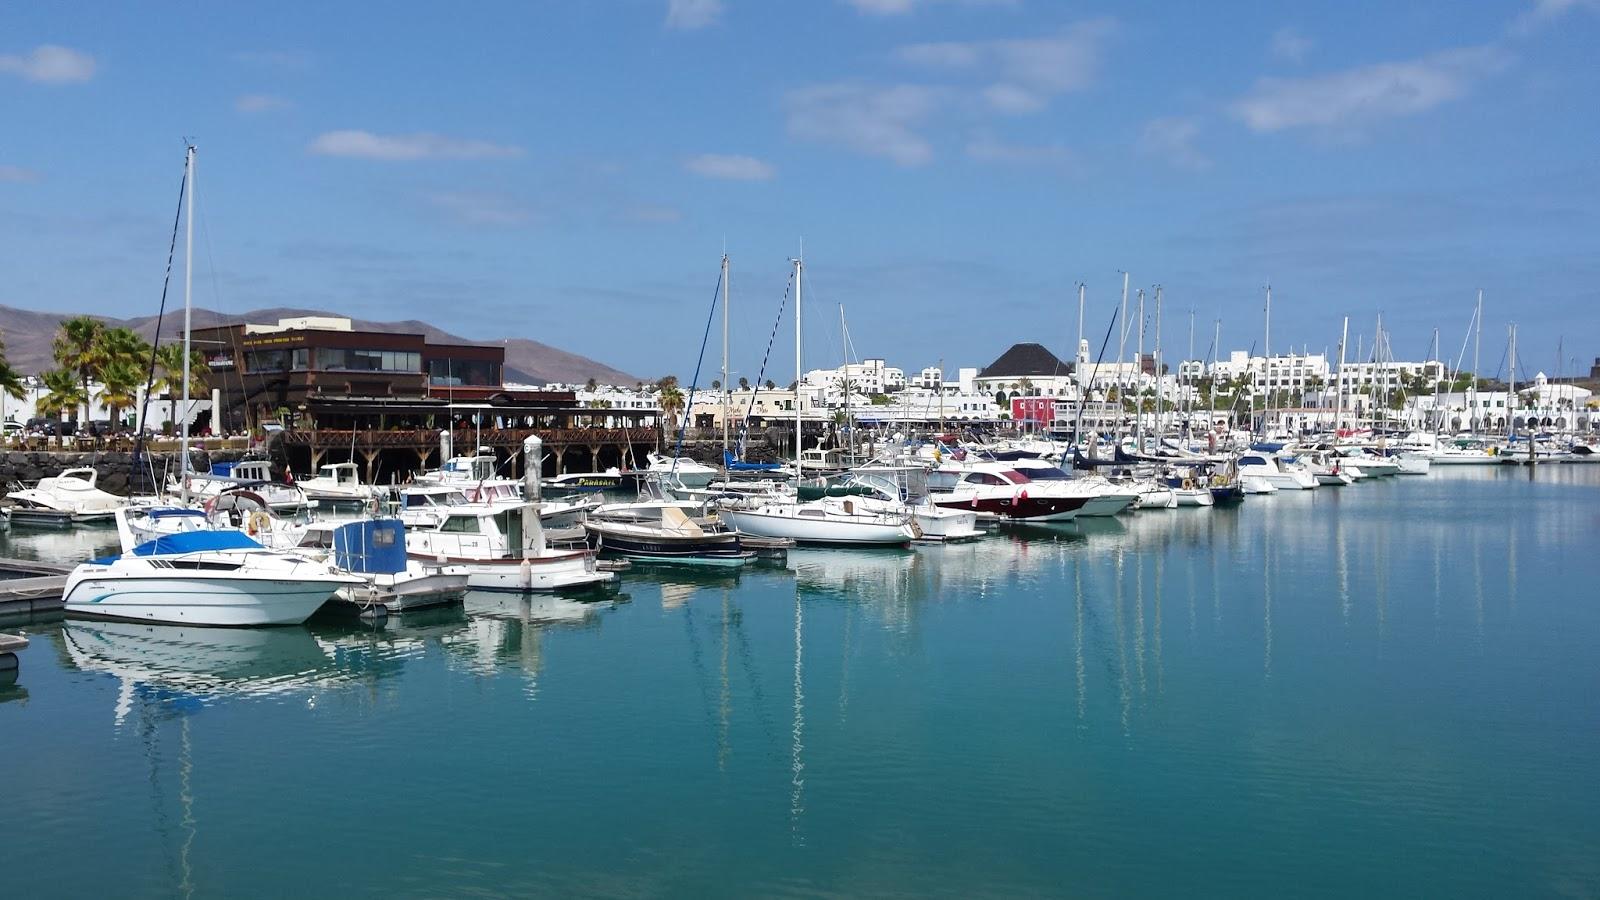 Marina Rubicon, Lanzarote, Wyspy Kanaryjskie, Hiszpania, Espana,Spain, turystyka, Kanary, blog o Hiszpanii